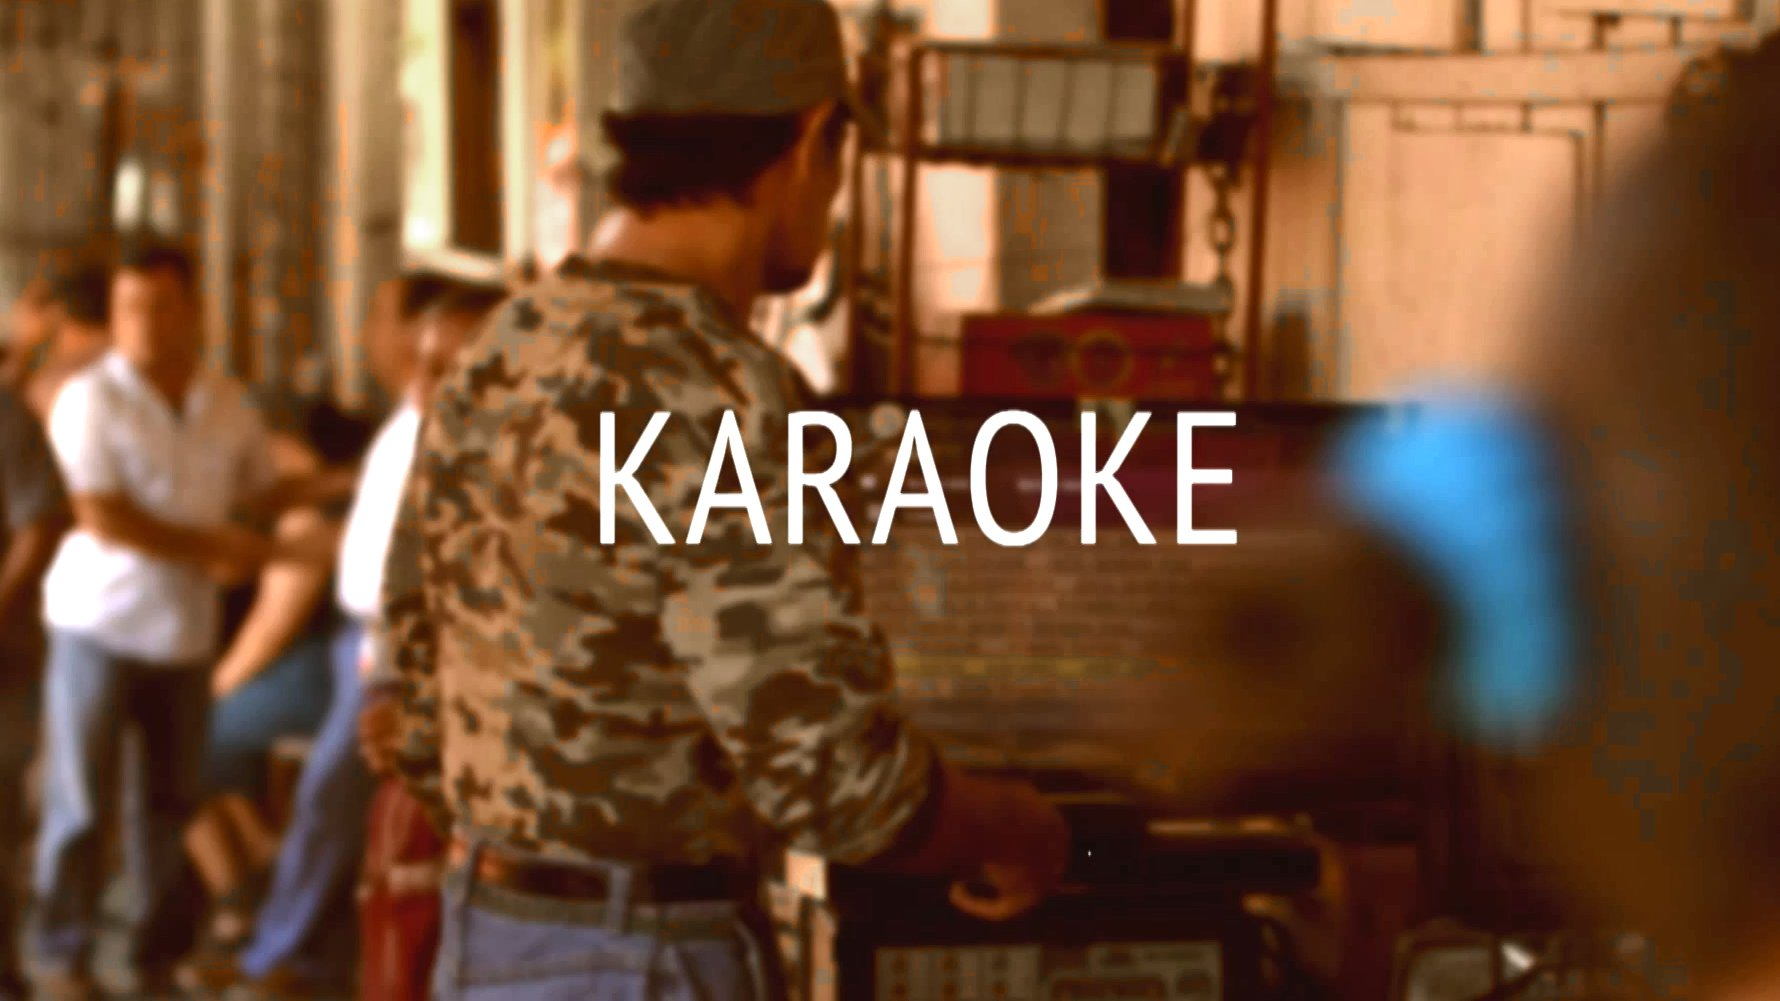 Juan sing Karaoke in Berlin, El Salvador.